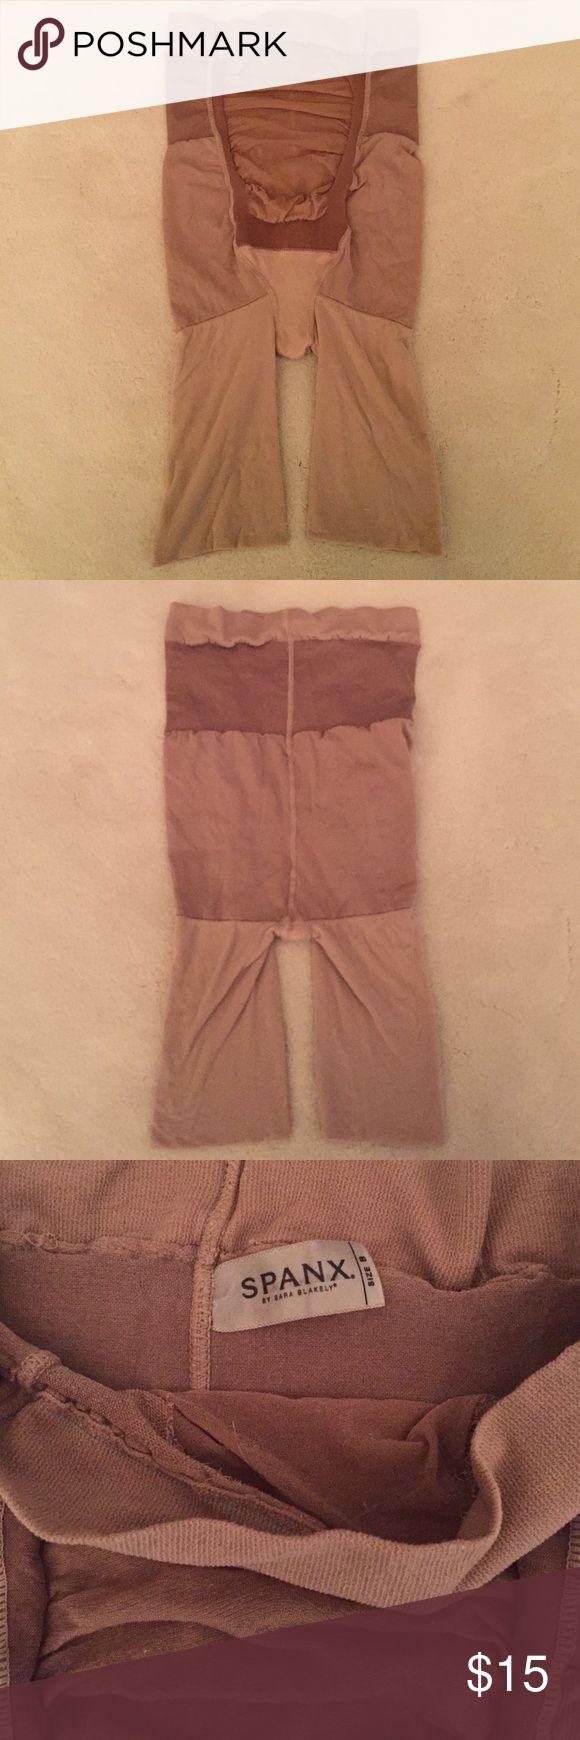 Maternity SPANX size B! Maternity SPANX size B! SPANX Intimates & Sleepwear Shapewear